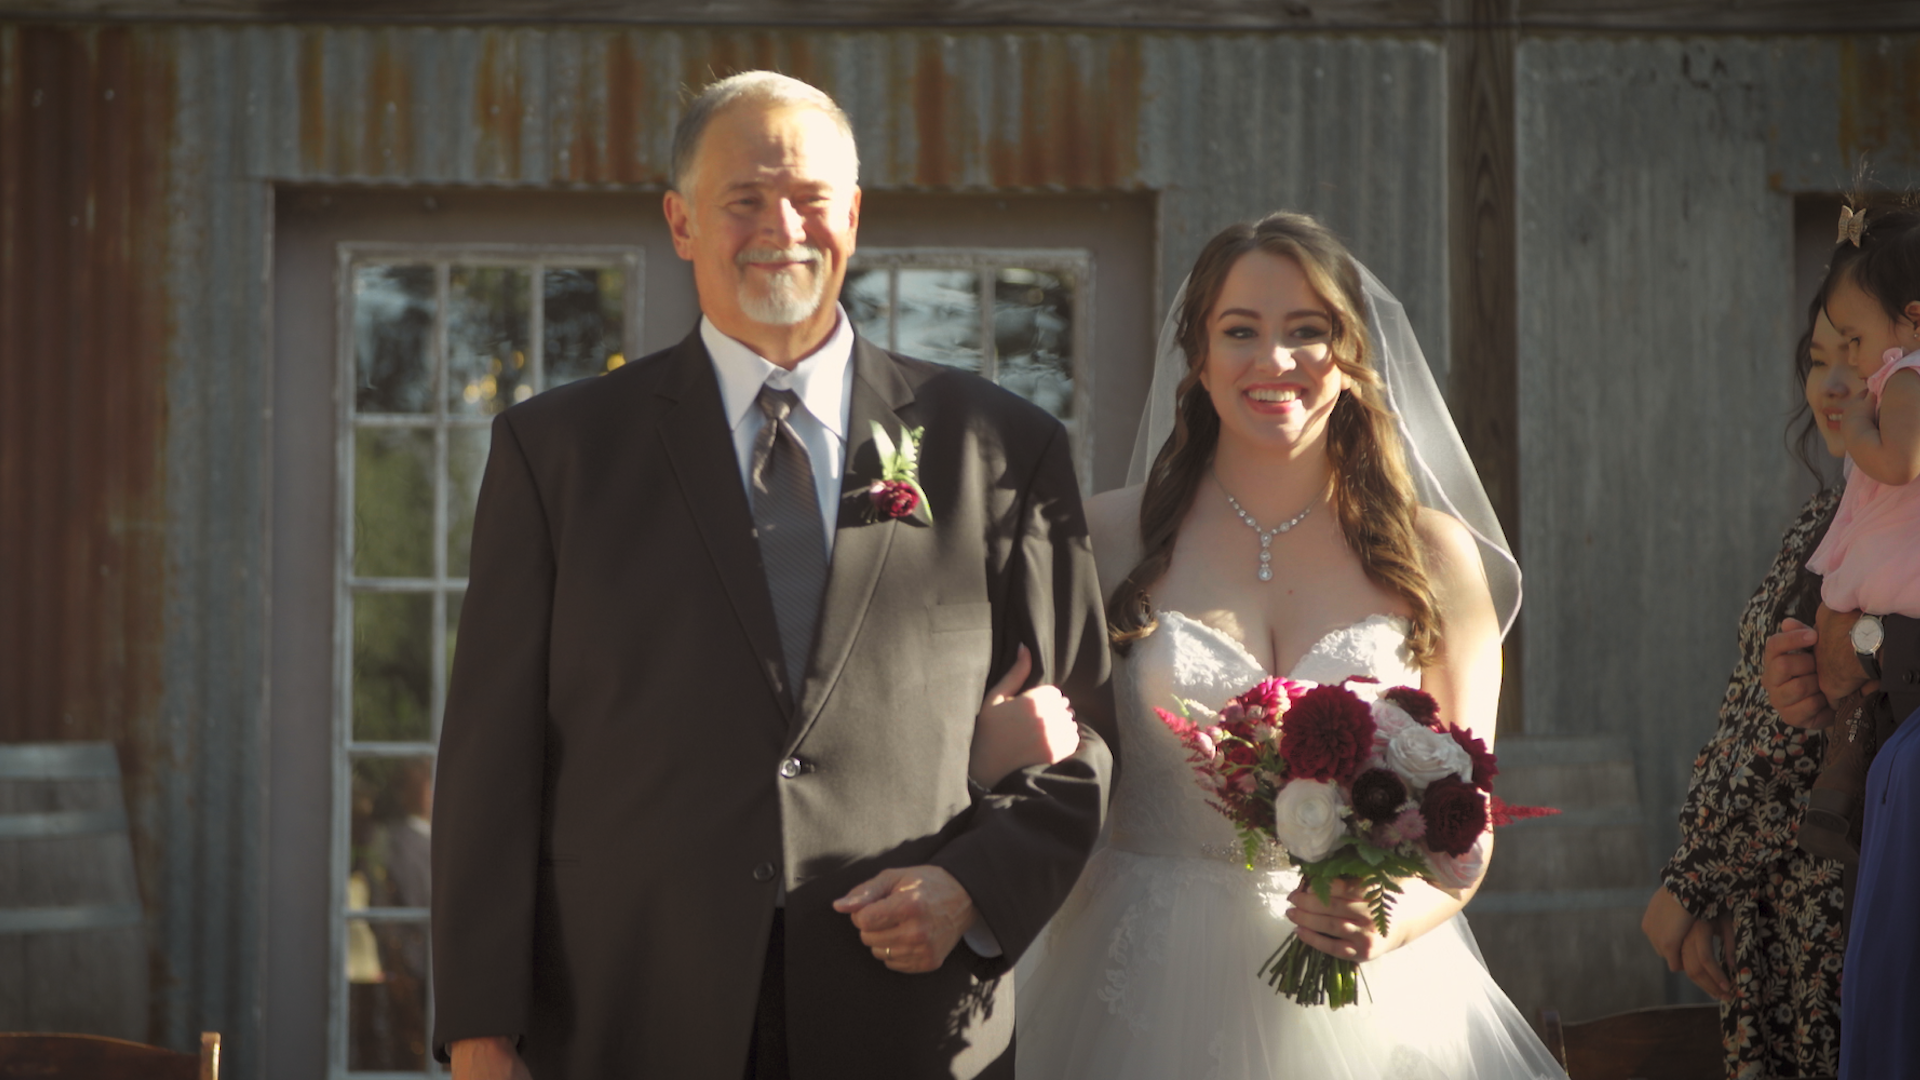 Rebecca_and_Daniel_Wedding_Austin_Texas_Vista_West_Ranch11.png